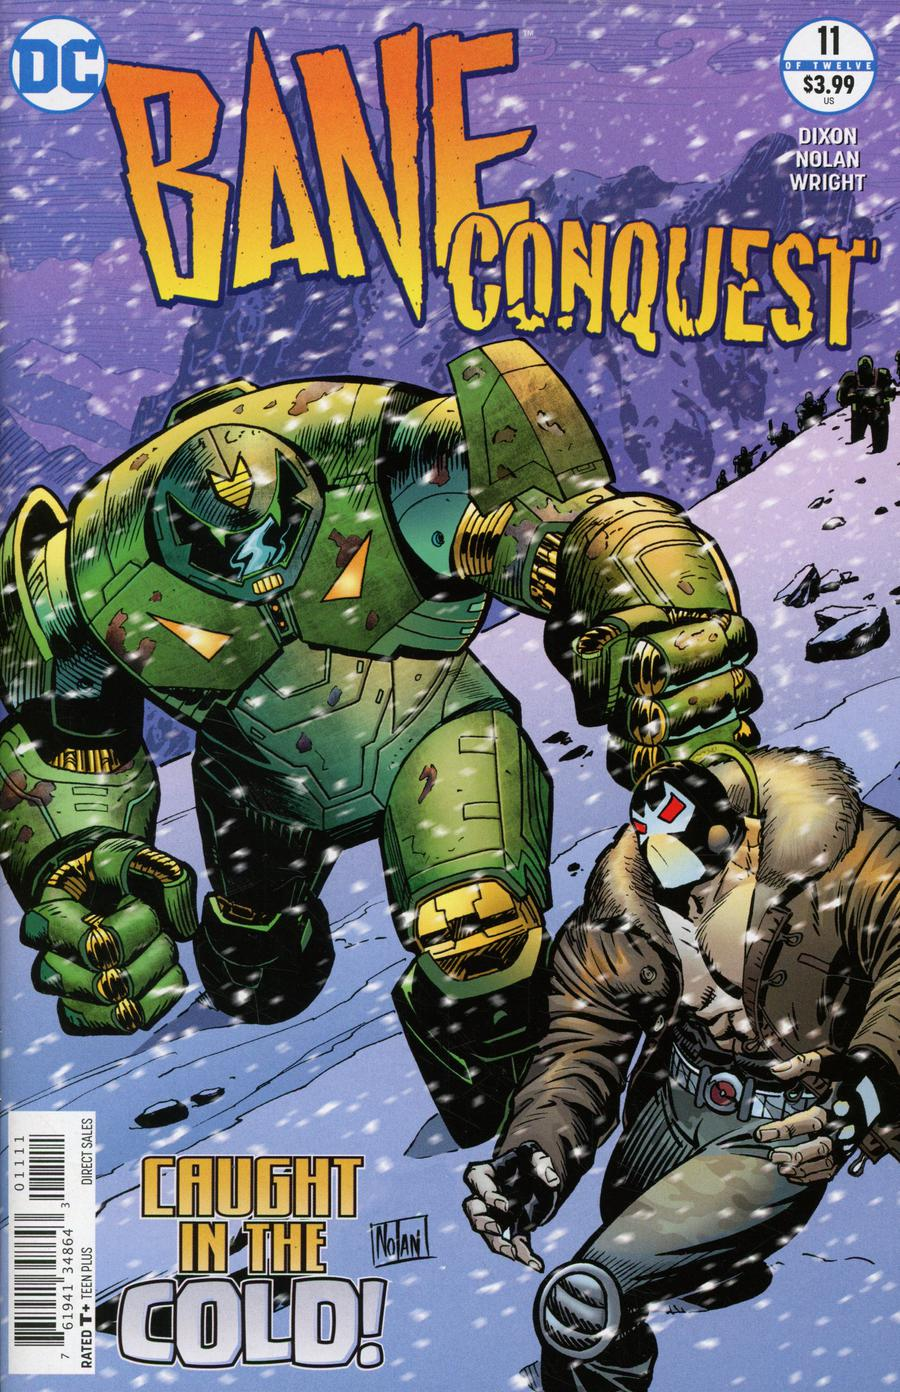 Bane Conquest #11